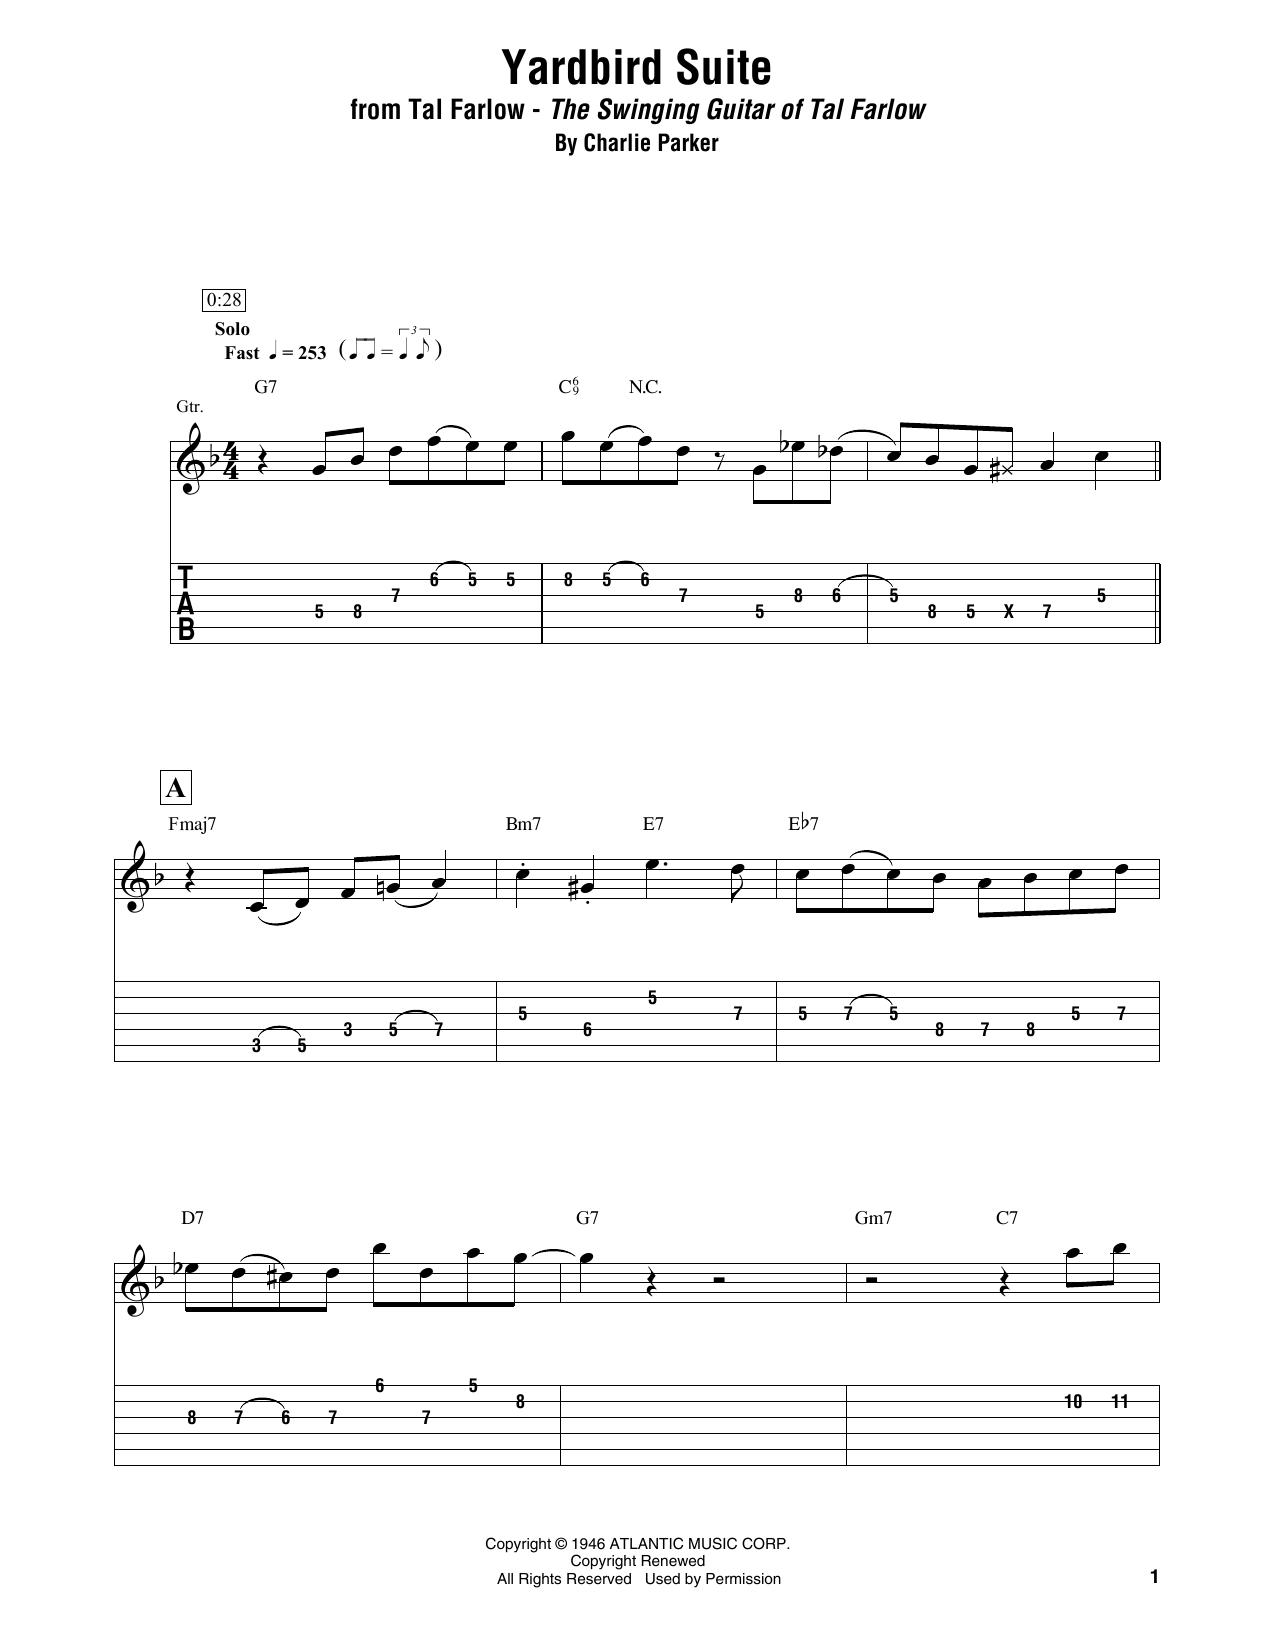 Yardbird Suite (Electric Guitar Transcription)